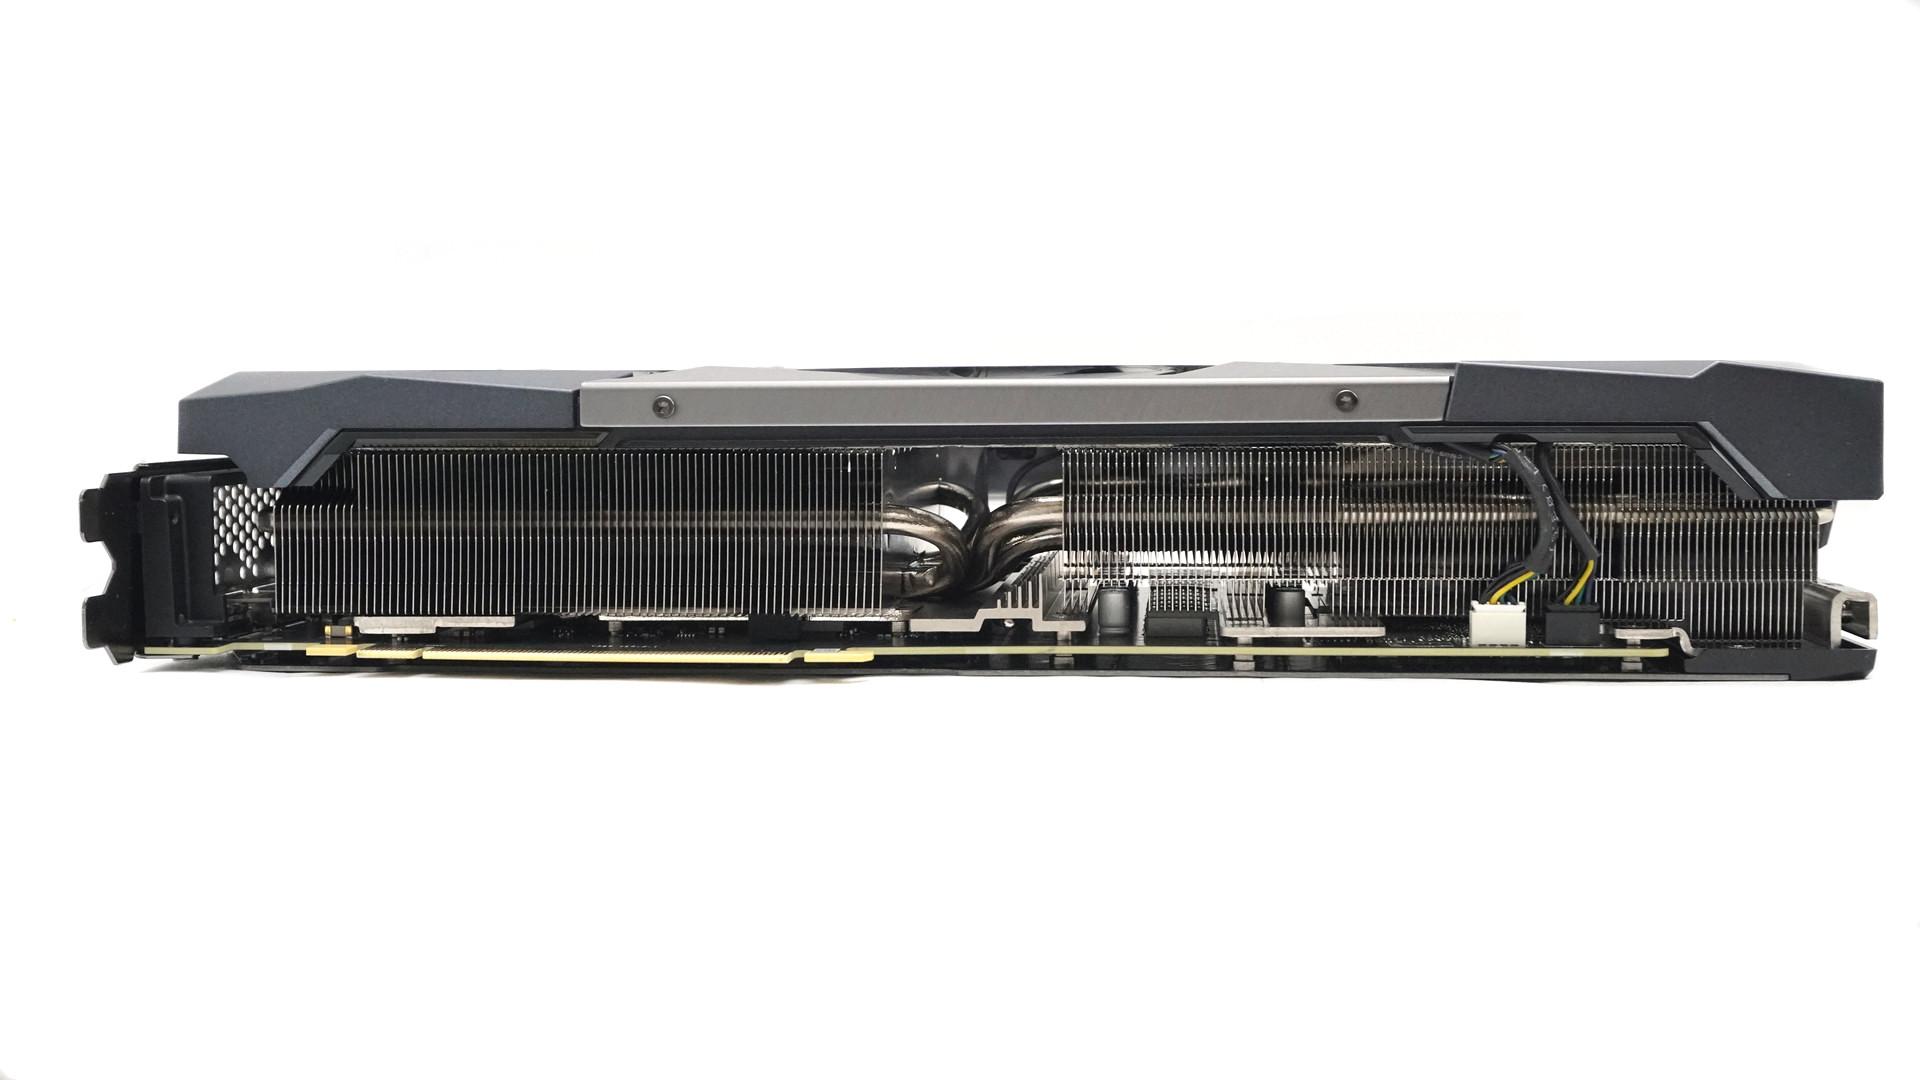 Cooler2 DSC01118s